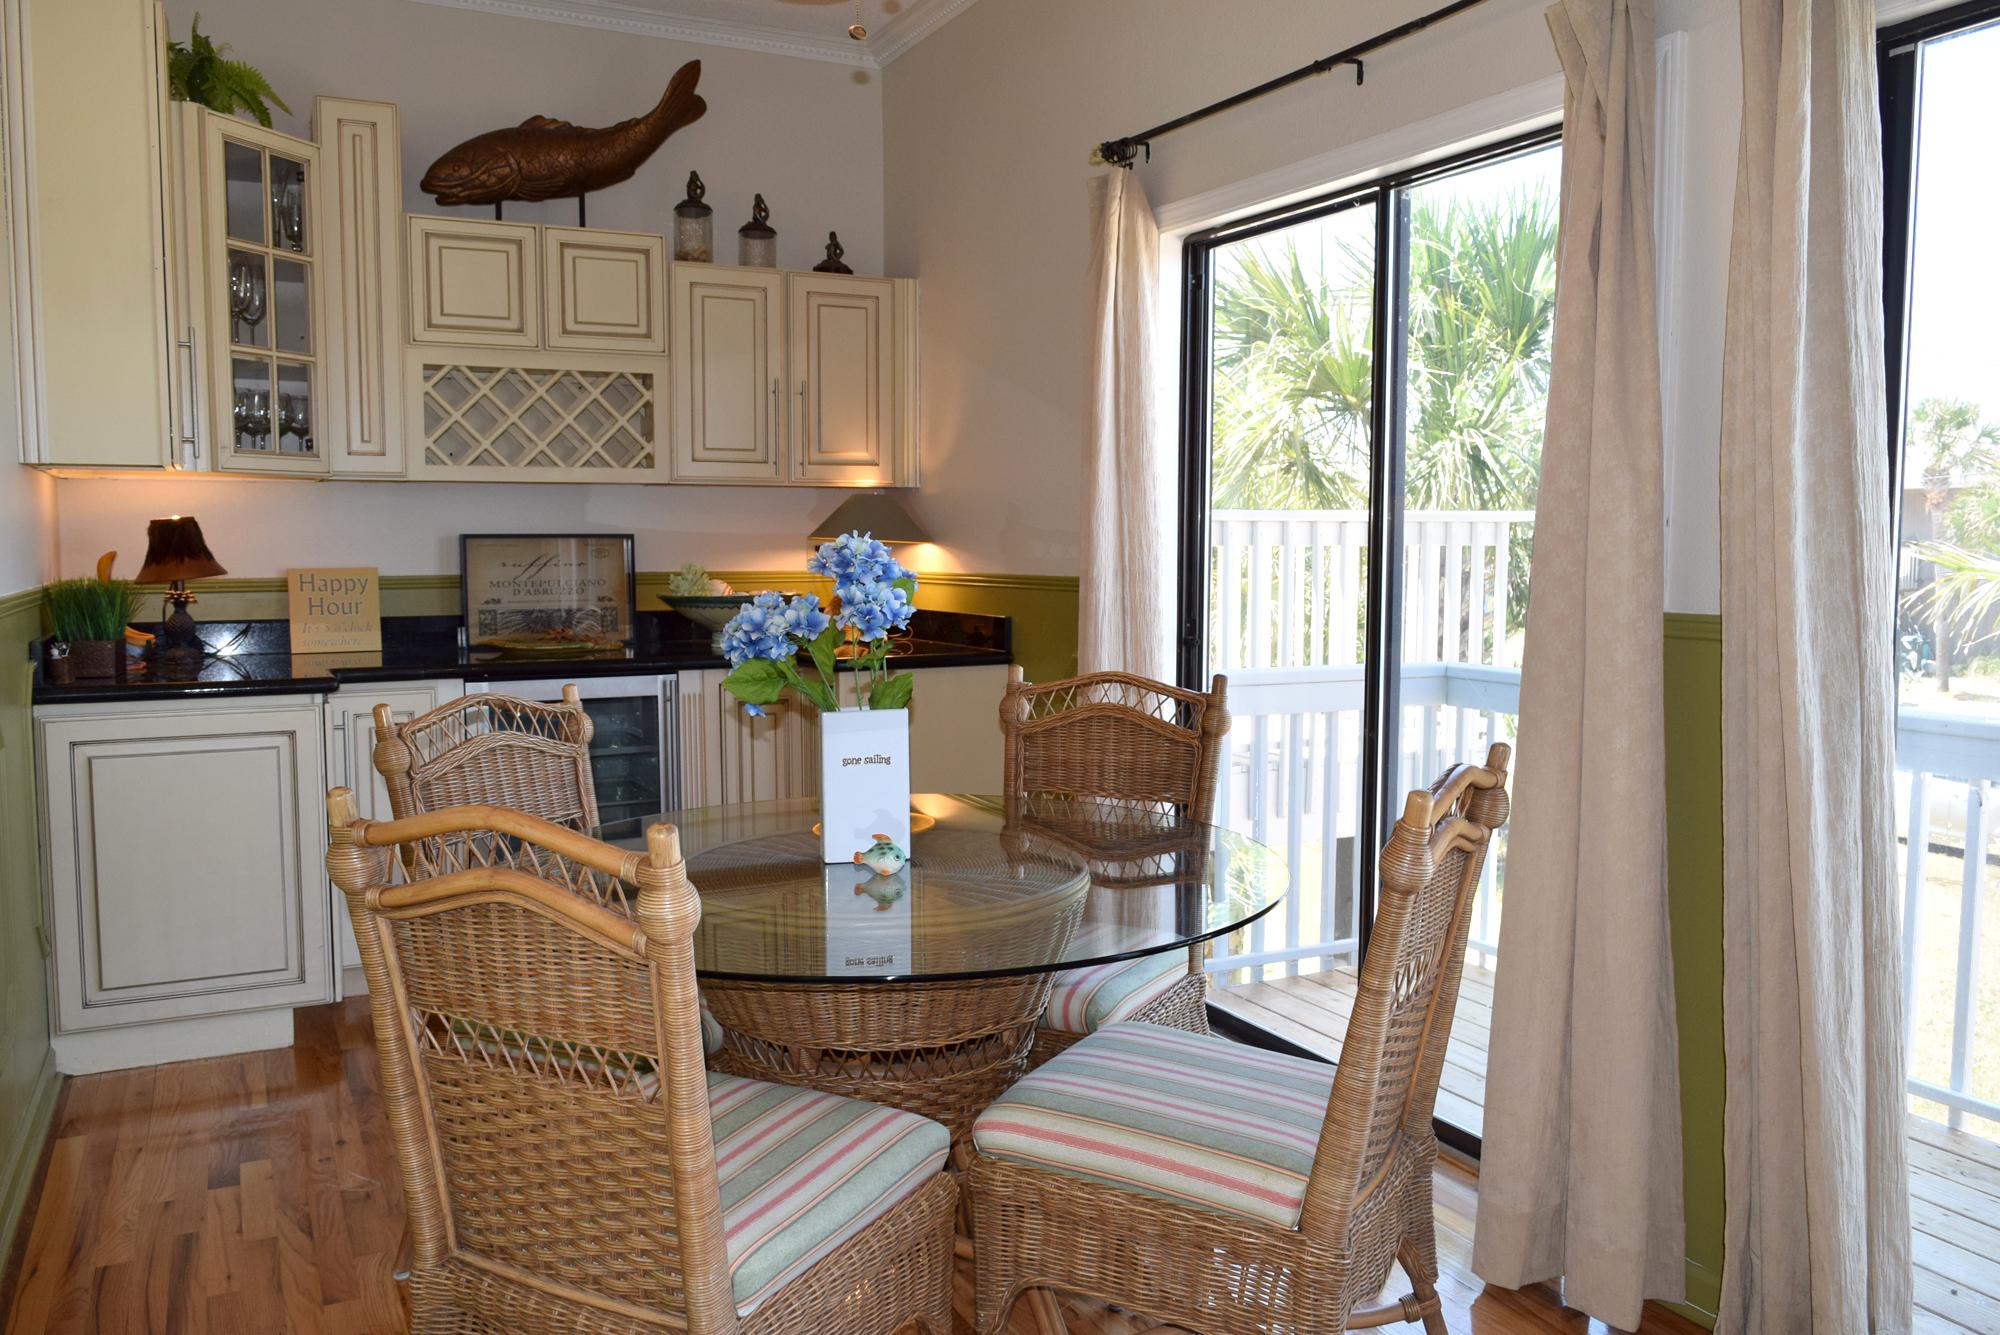 Maldonado 1010 House/Cottage rental in Pensacola Beach House Rentals in Pensacola Beach Florida - #12